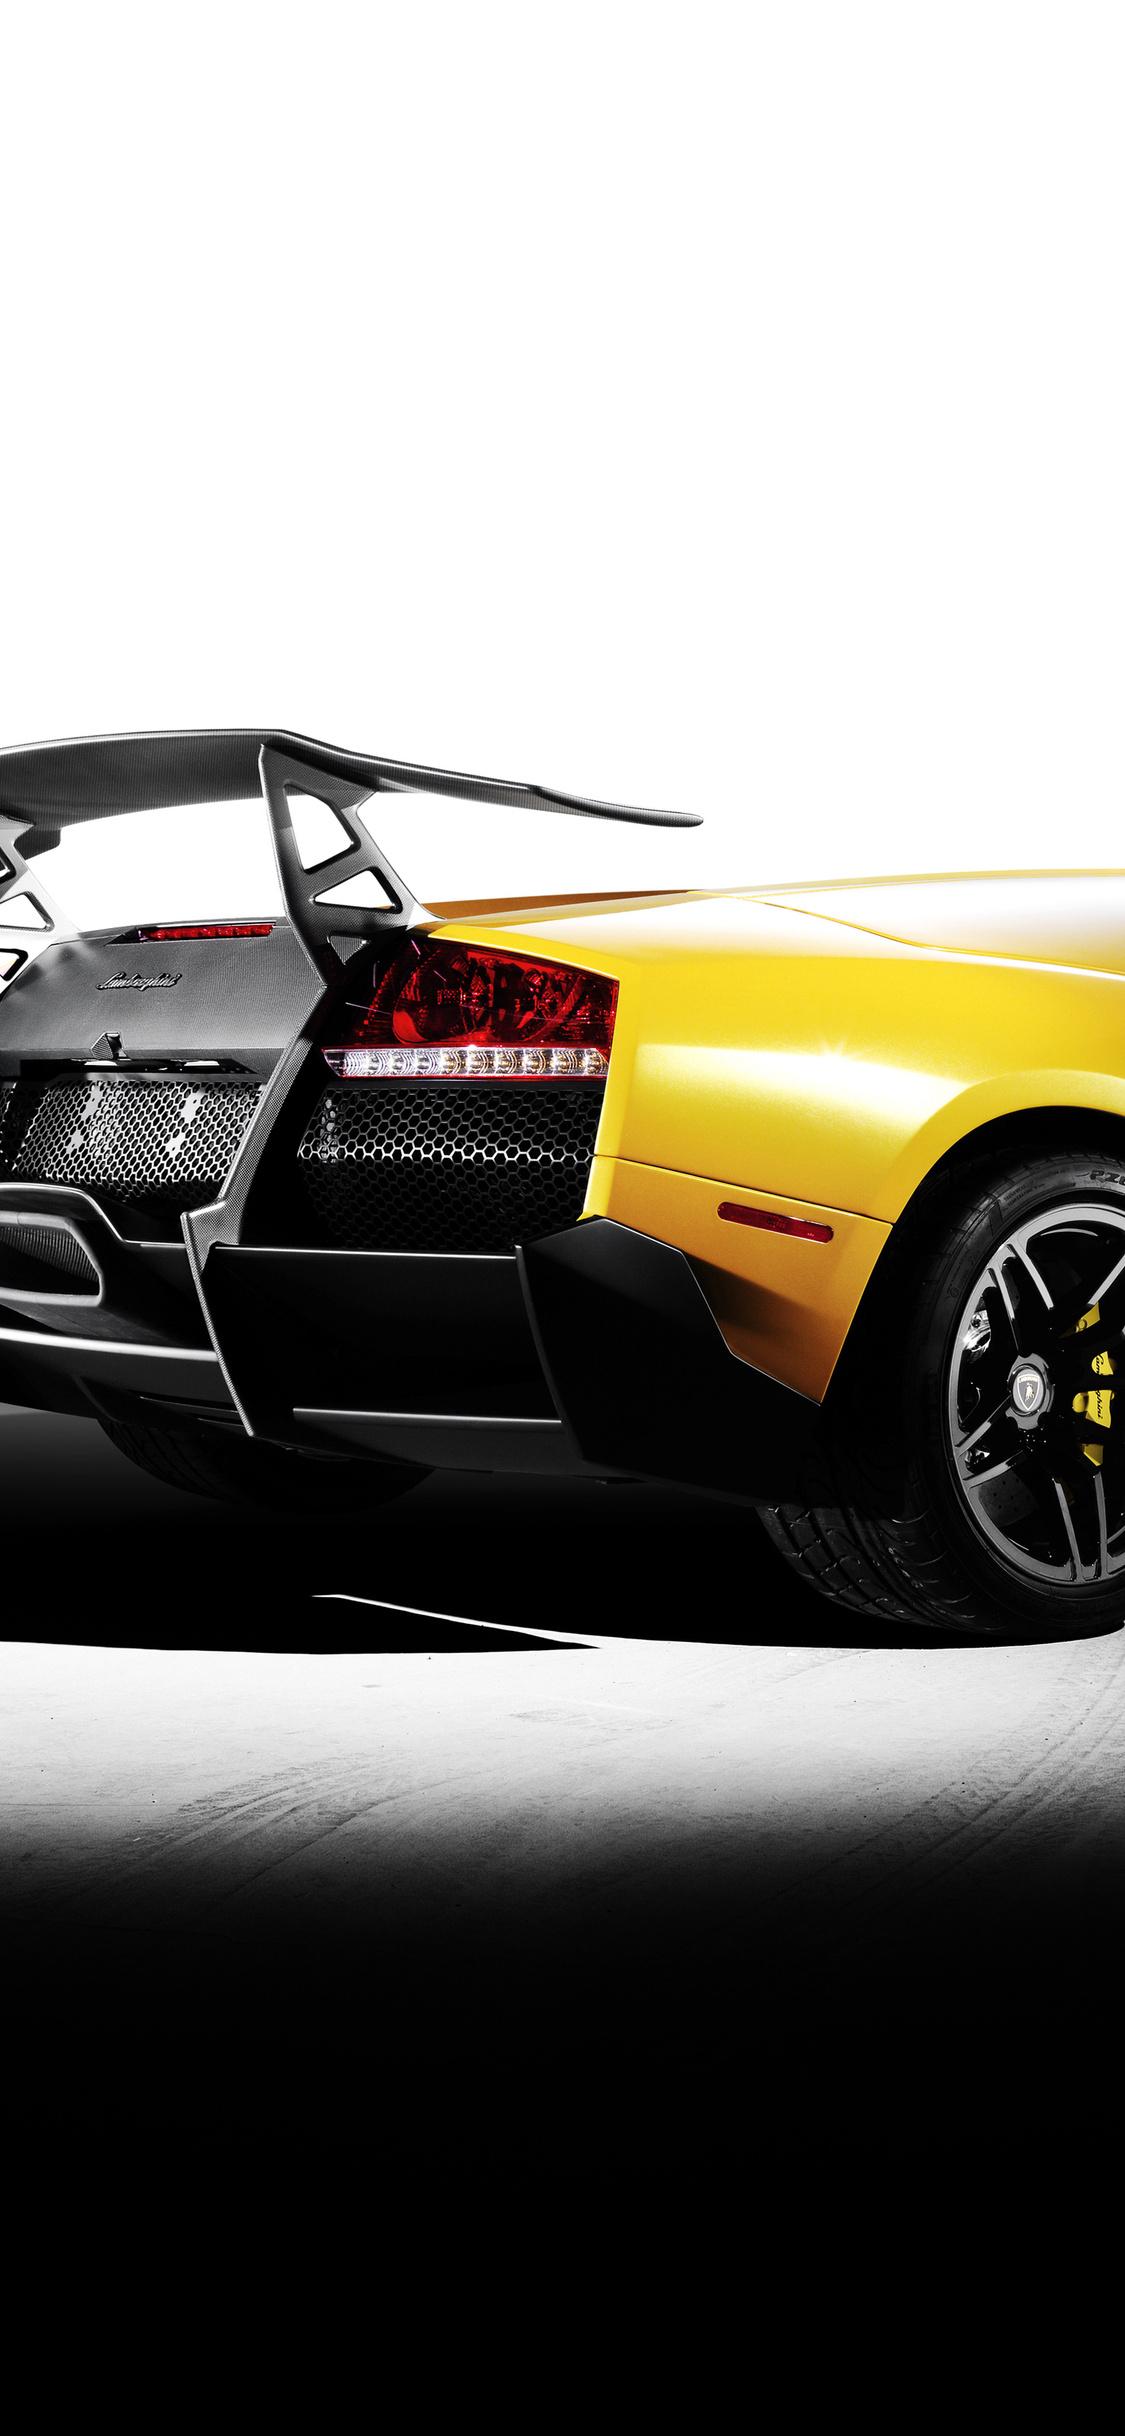 1125x2436 Lamborghini Murcielago Lp670 4 Iphone Xs Iphone 10